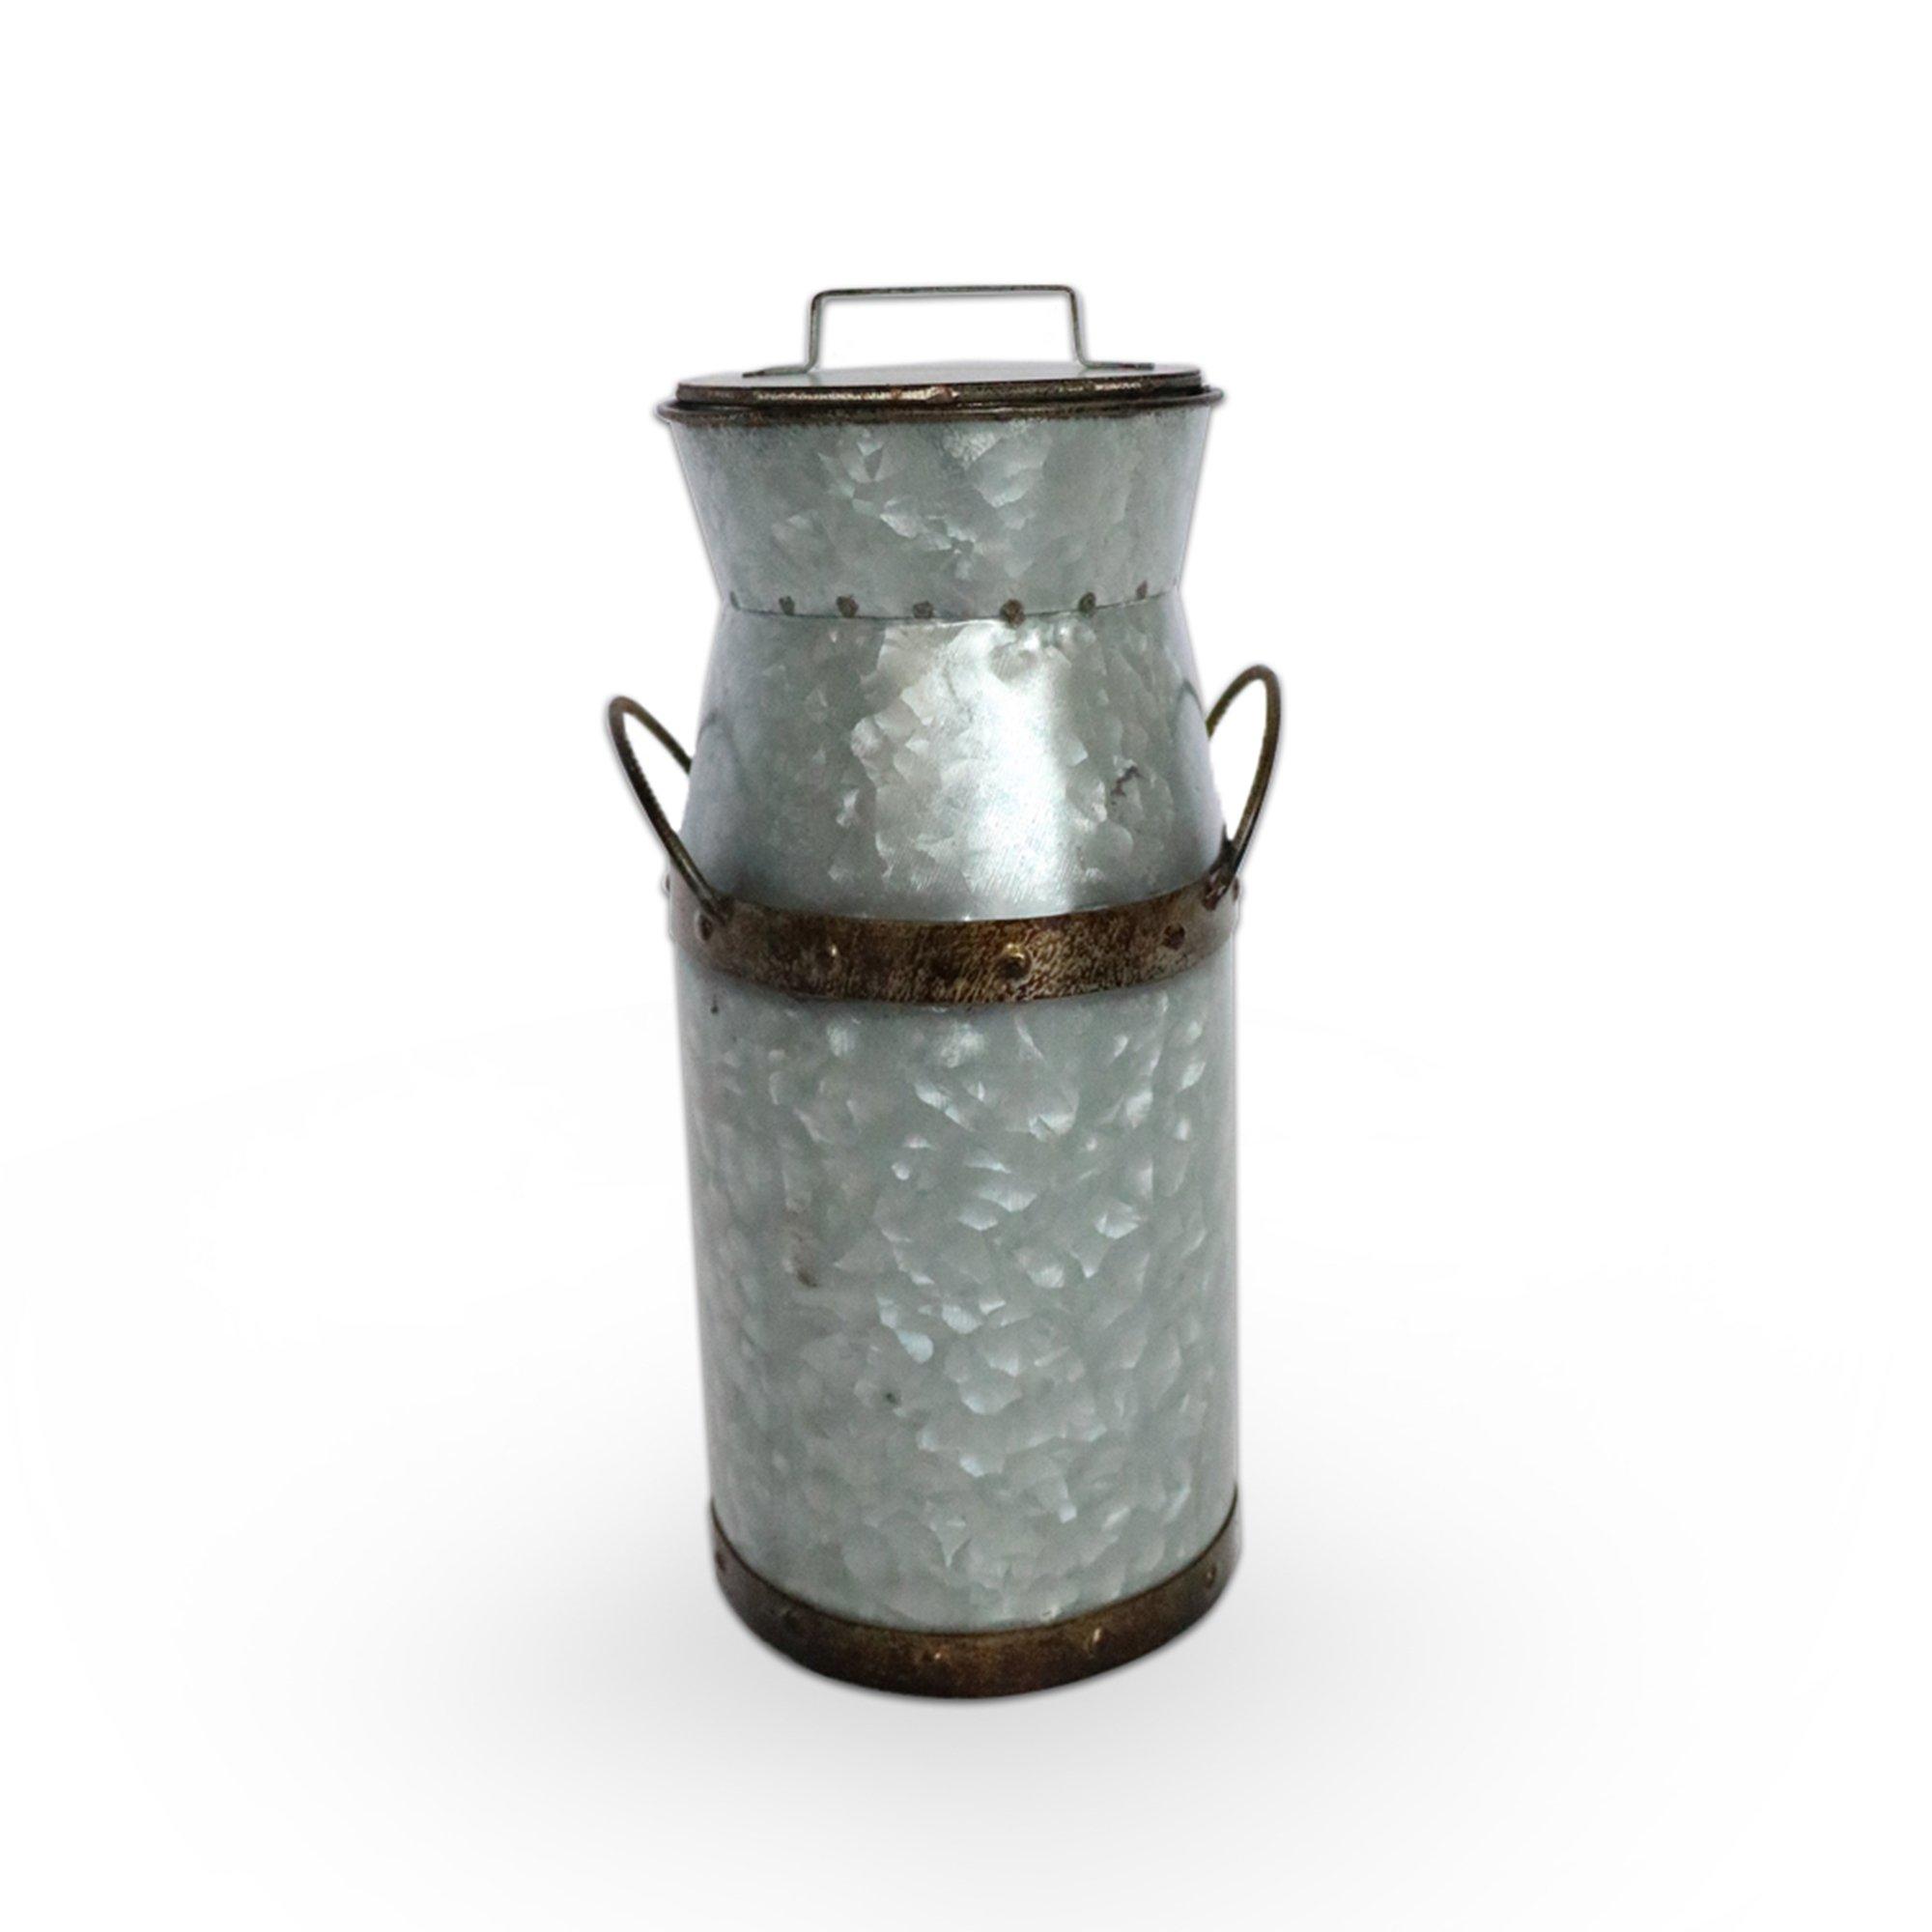 Barnyard Designs Rustic Galvanized Tin Milk Can, Jug | Vintage Rusty Distressed Farmhouse Vase, Country Primitive Home Decor, 11.75'' Height